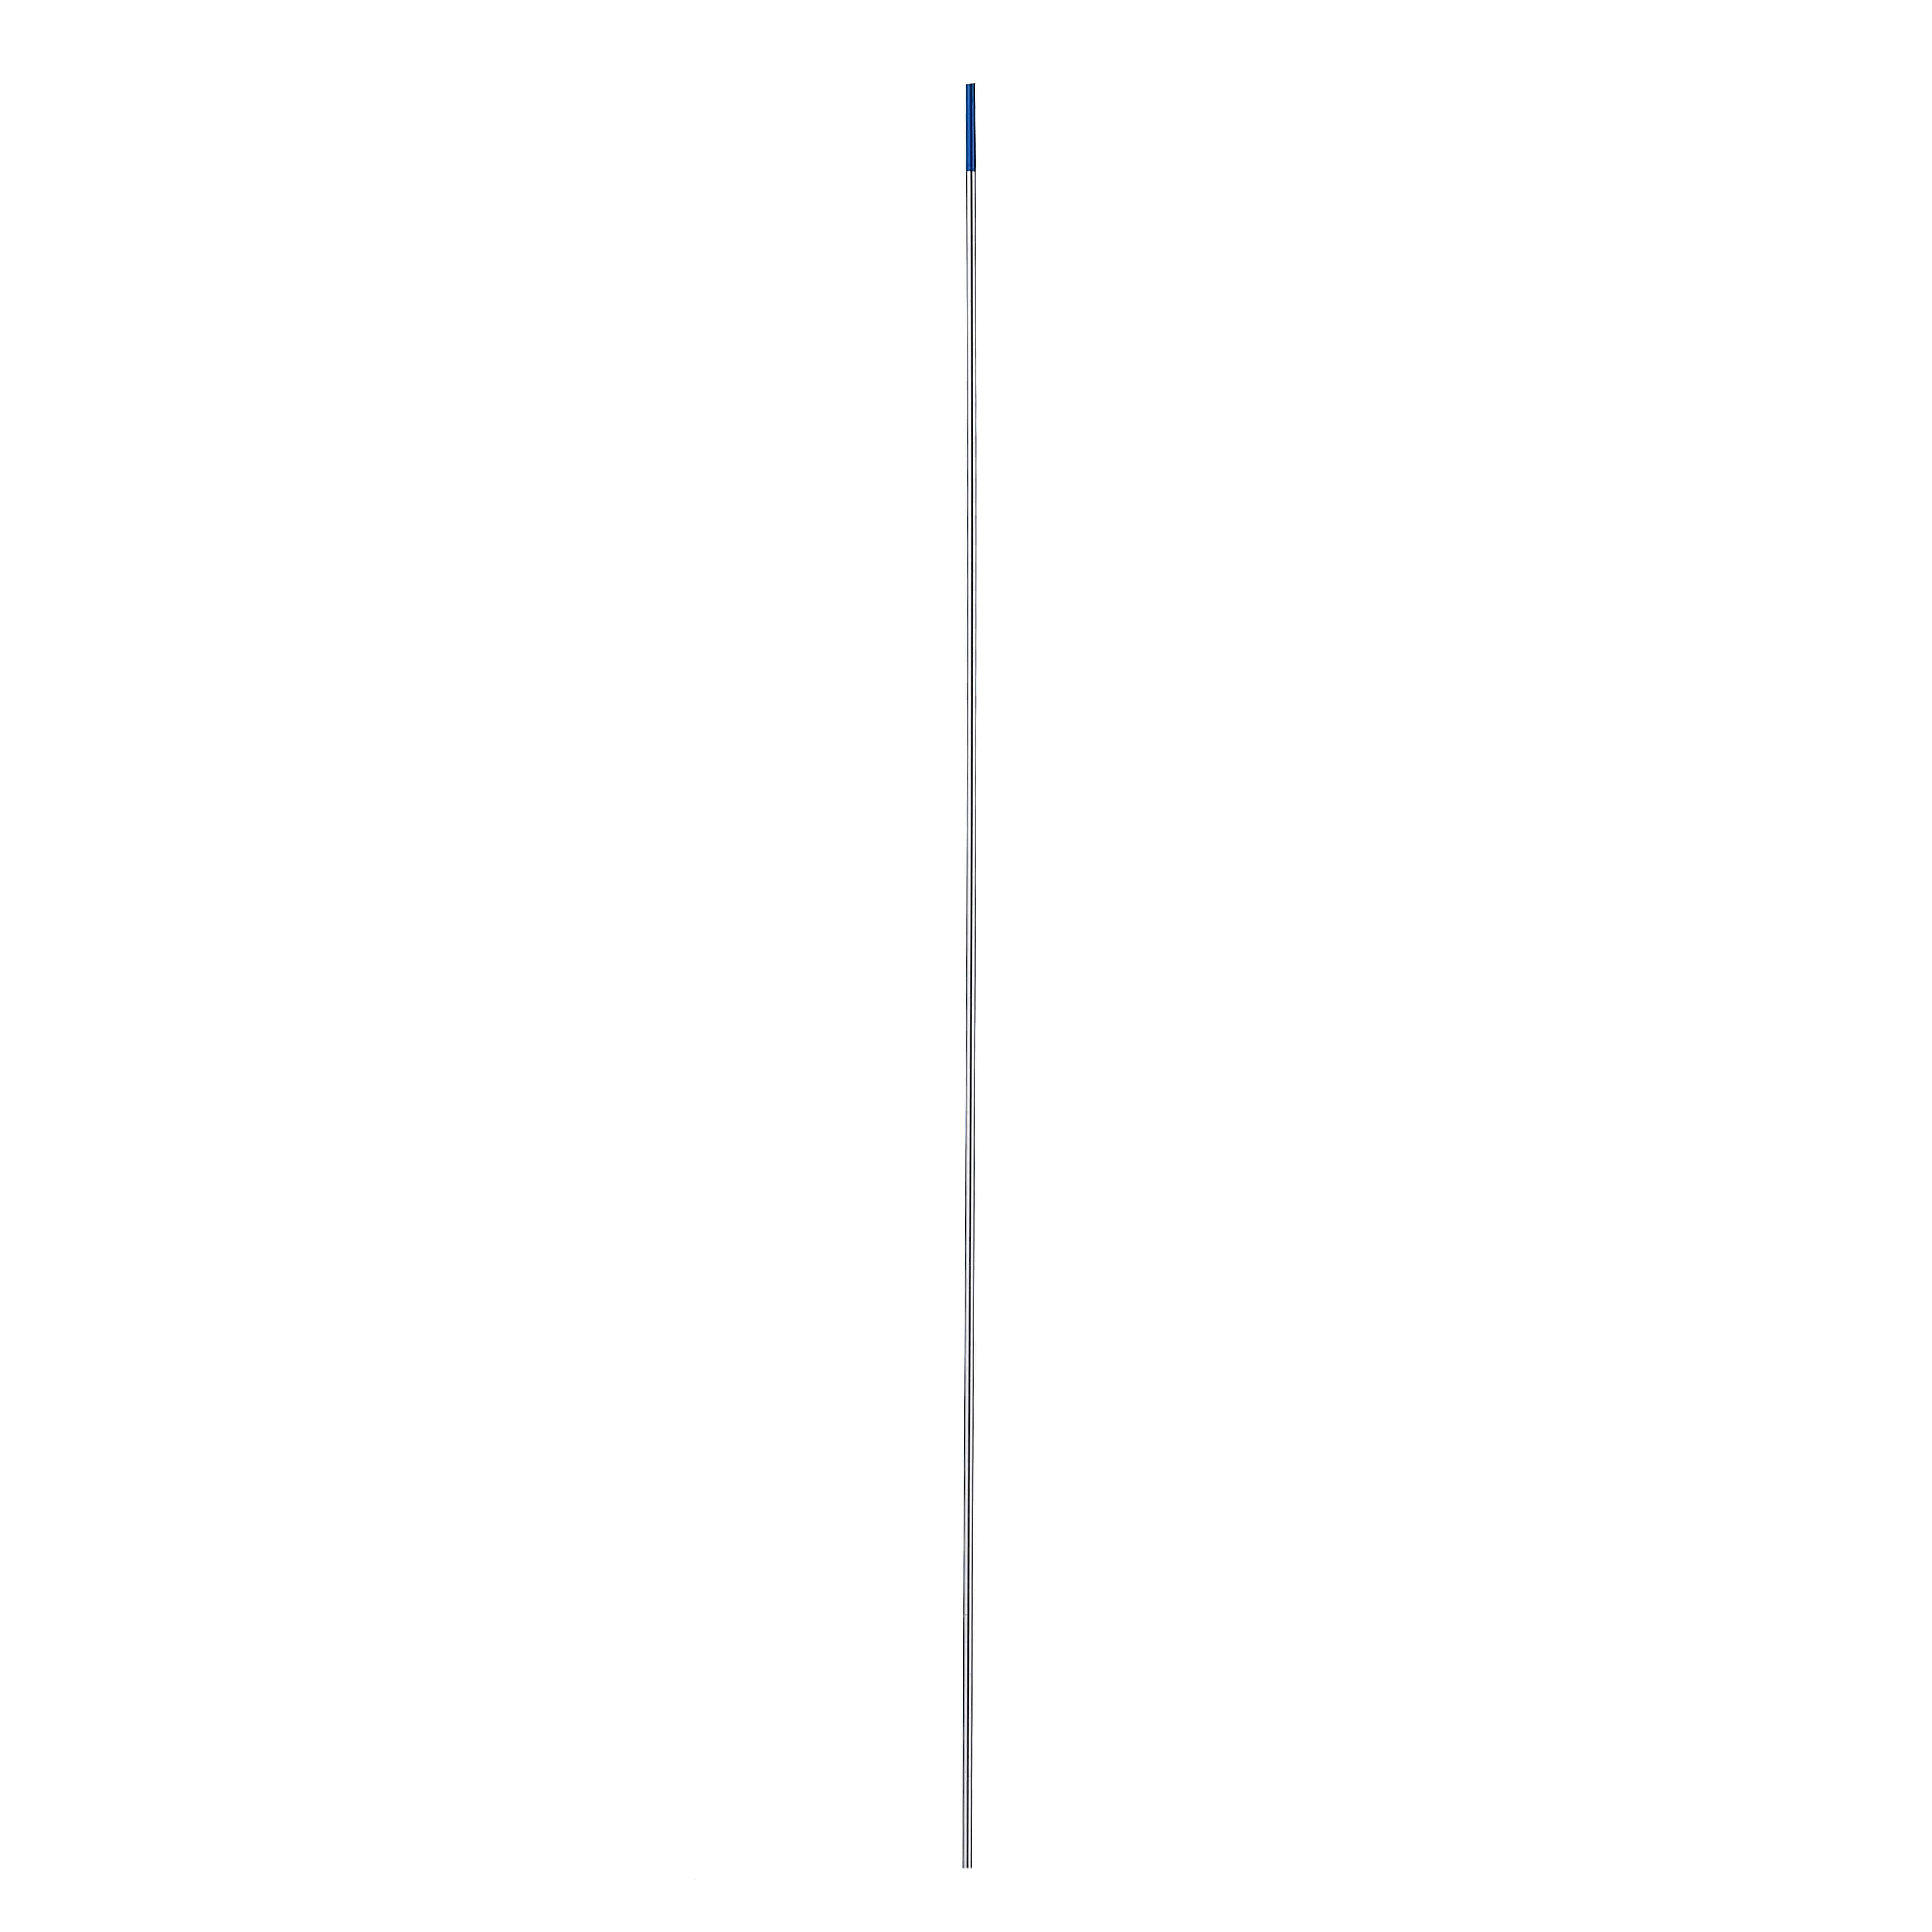 Электрод вольфрамовый ПТК WL-20-175мм Ø 1,0